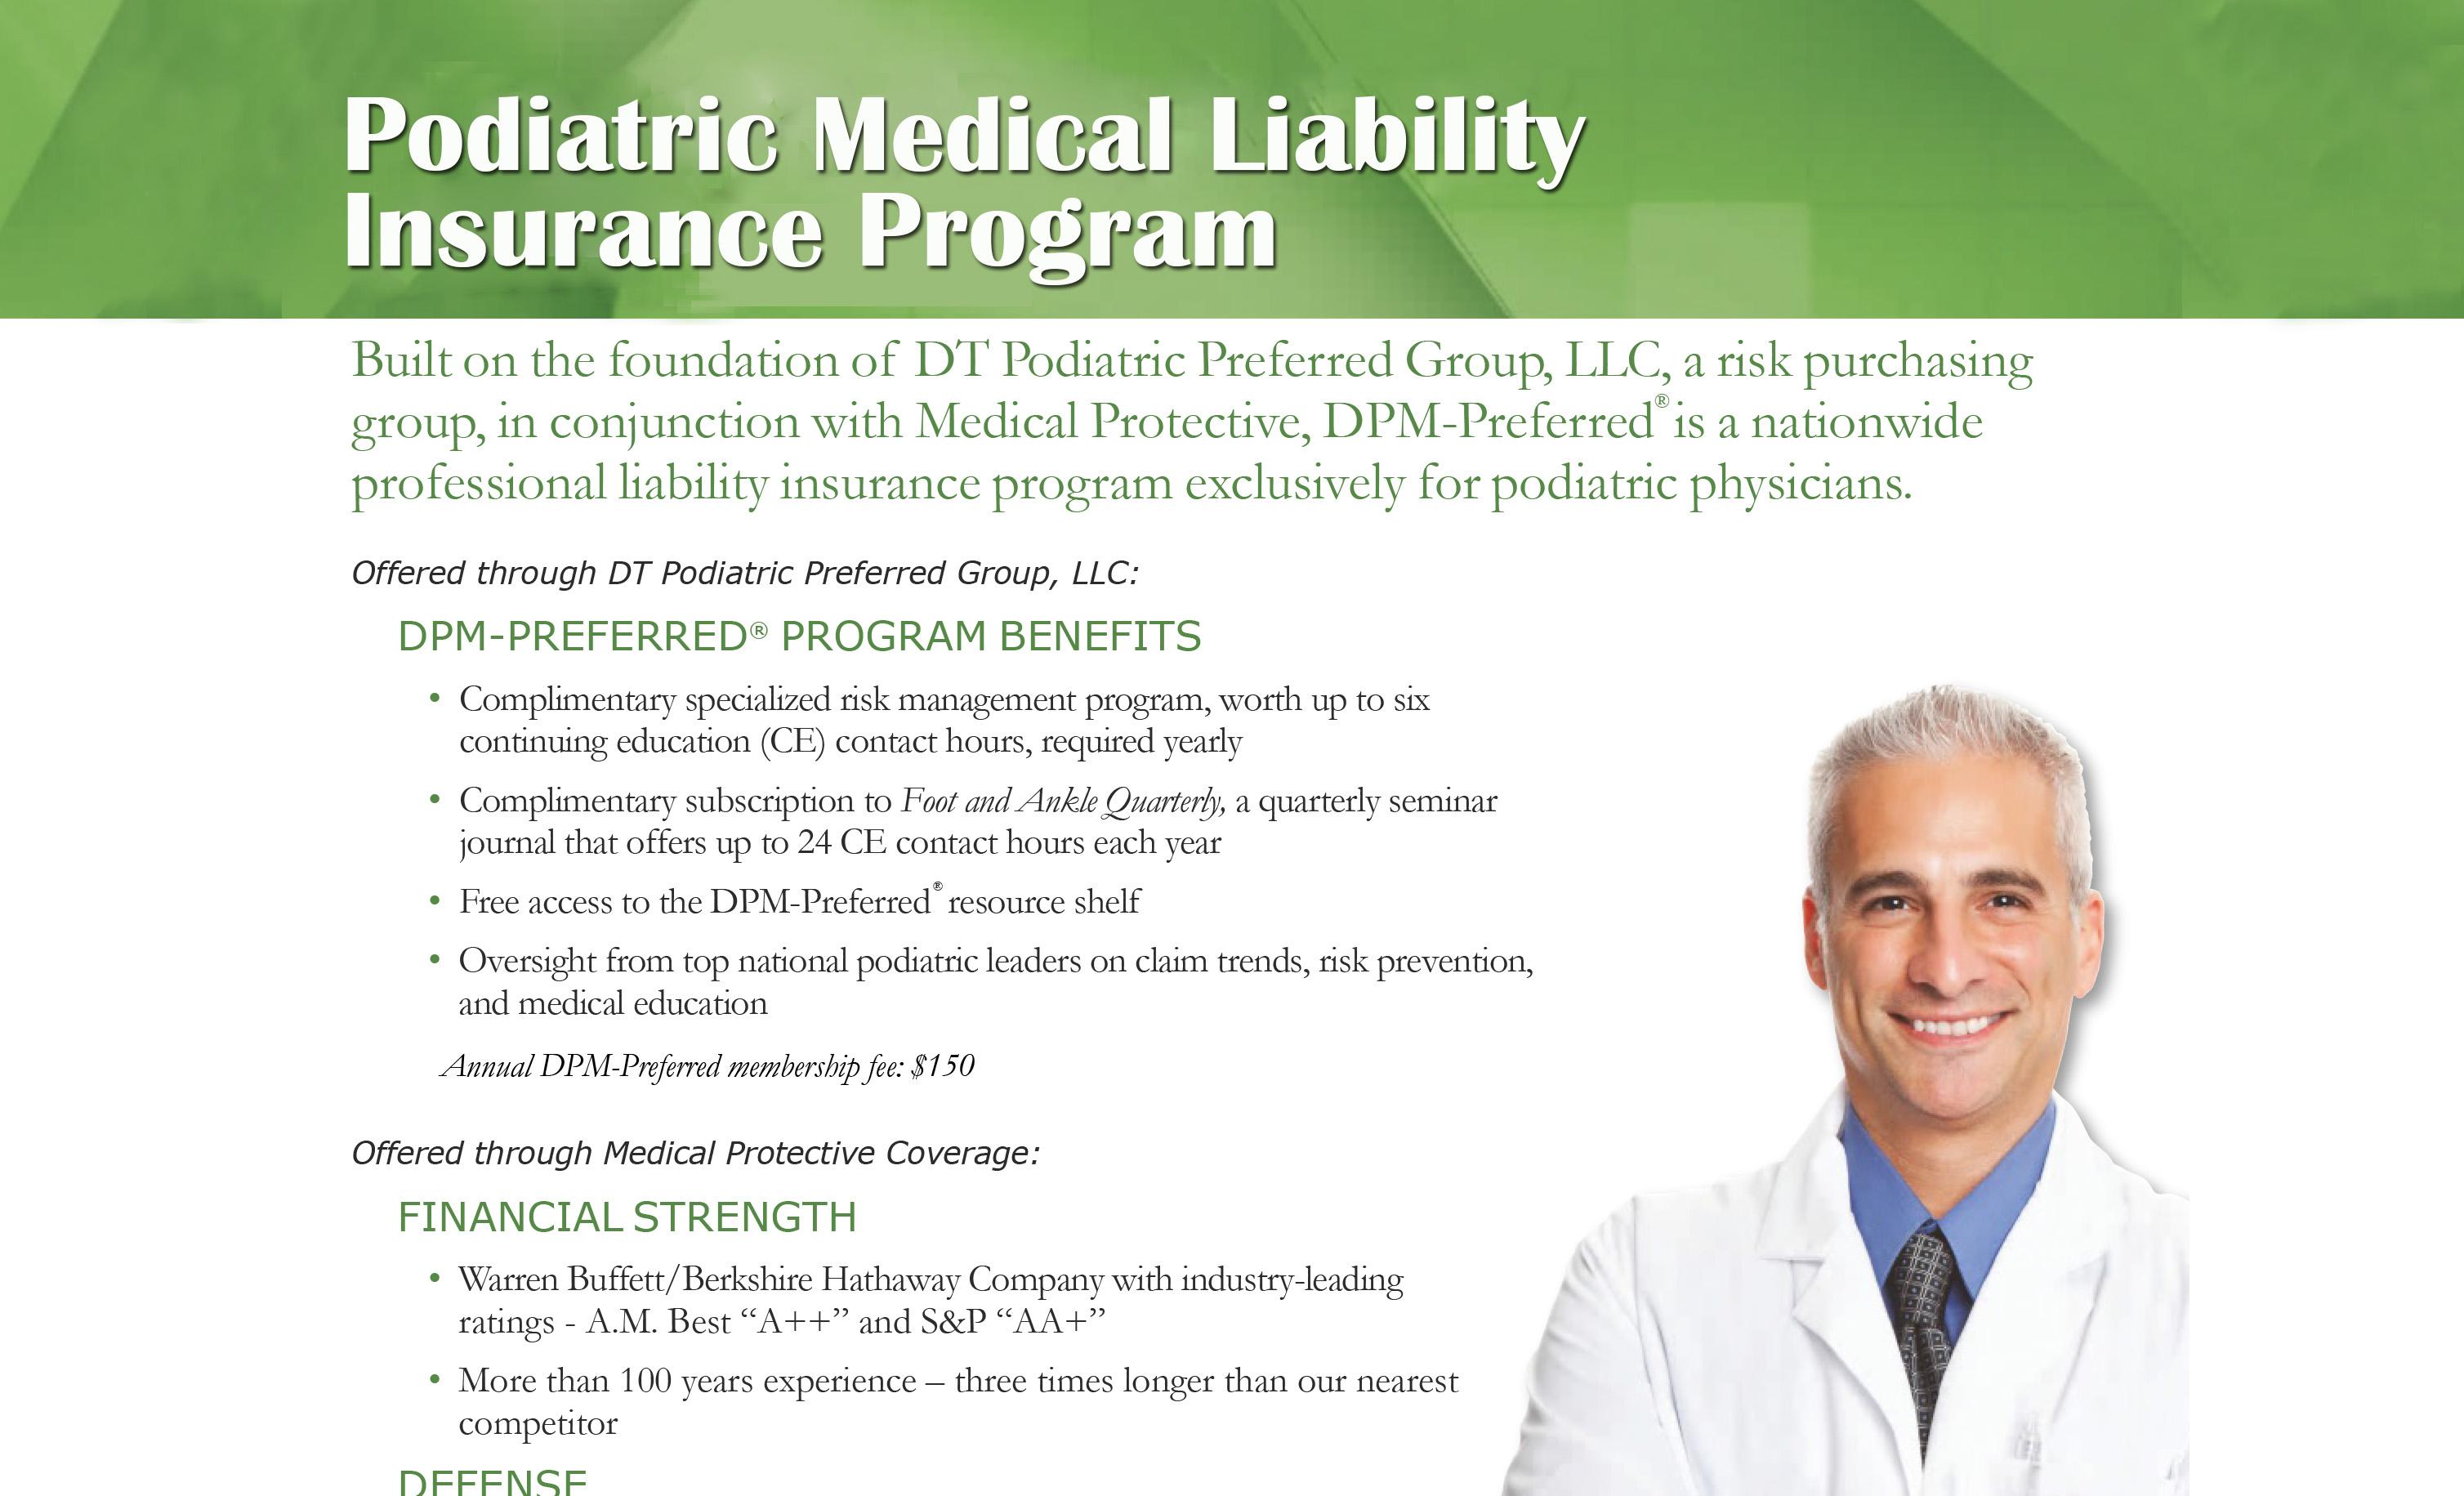 DPM Preferred Malpractice Insurance